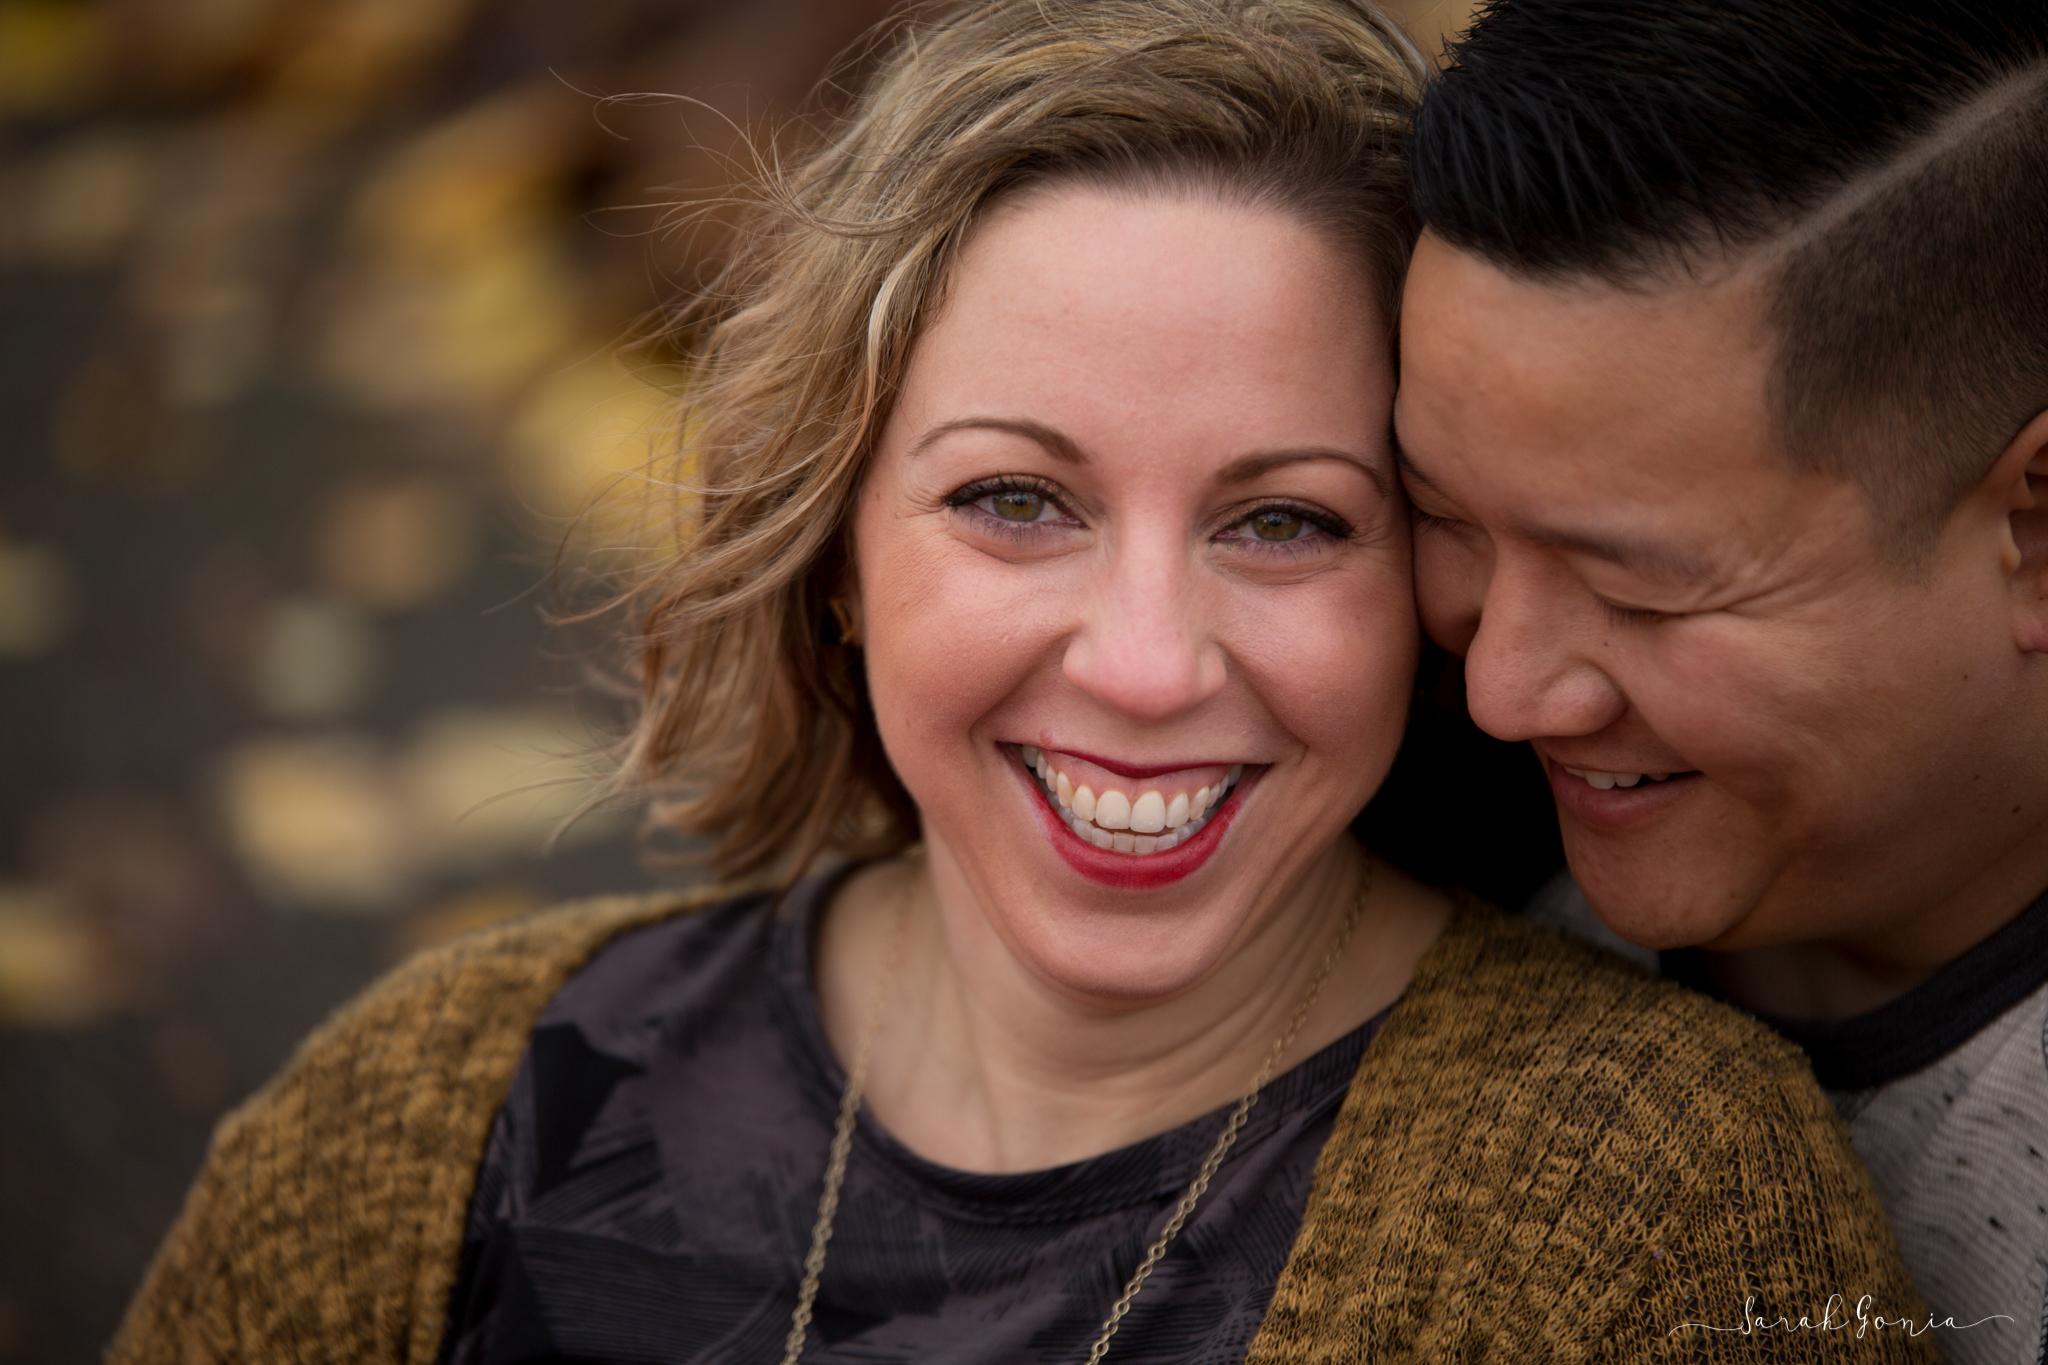 Olympia Tacoma Seattle Portrait Photographer